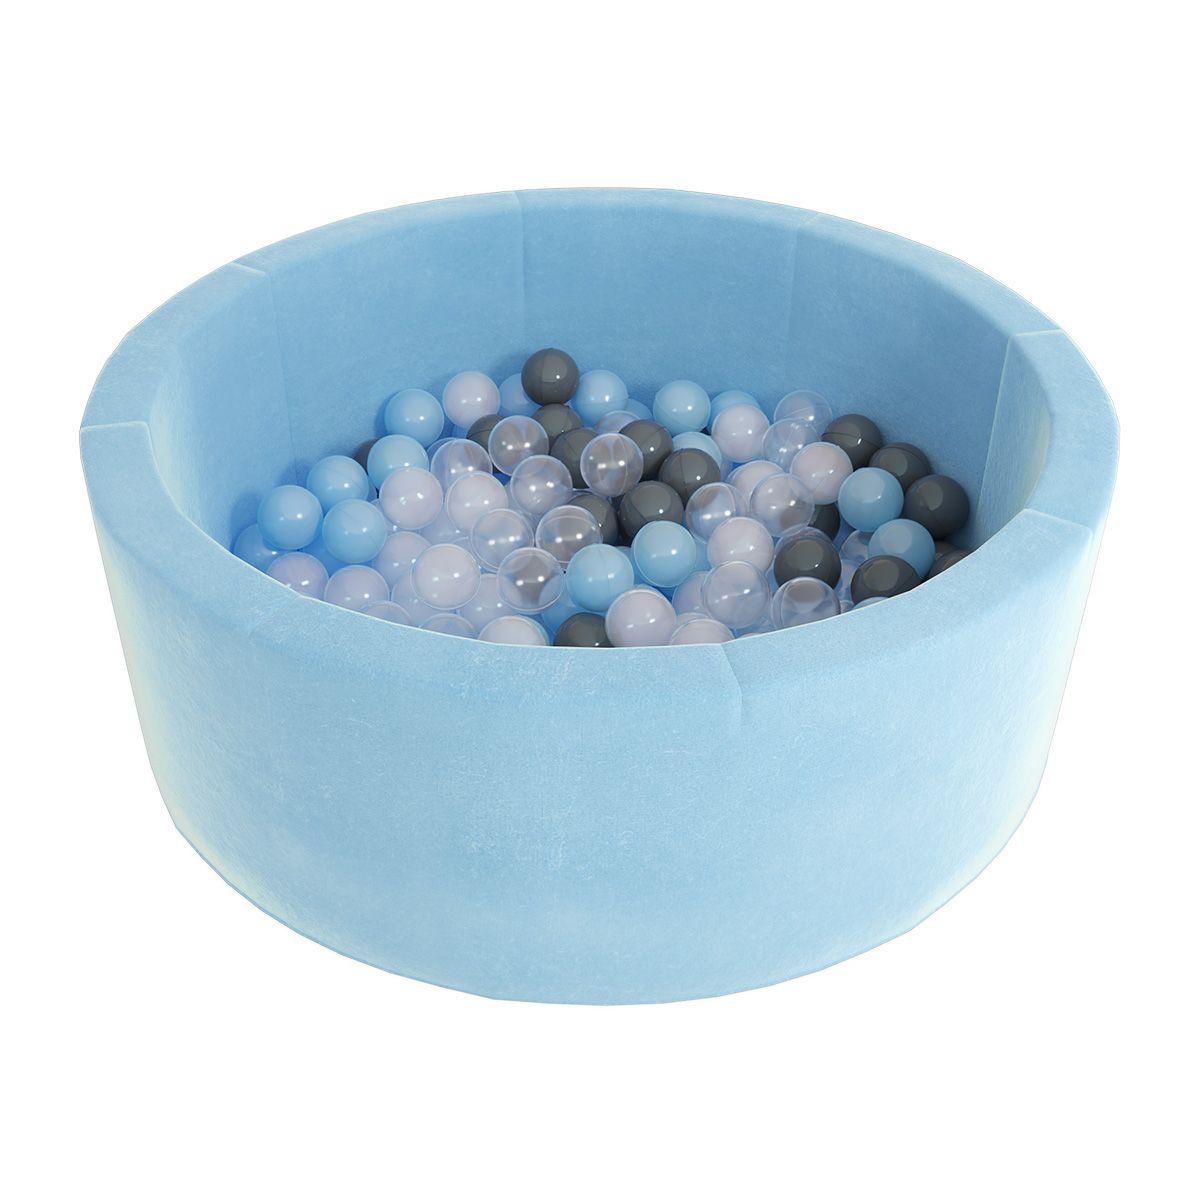 "Romana / Dry pool ""Airpool Max"", blue"